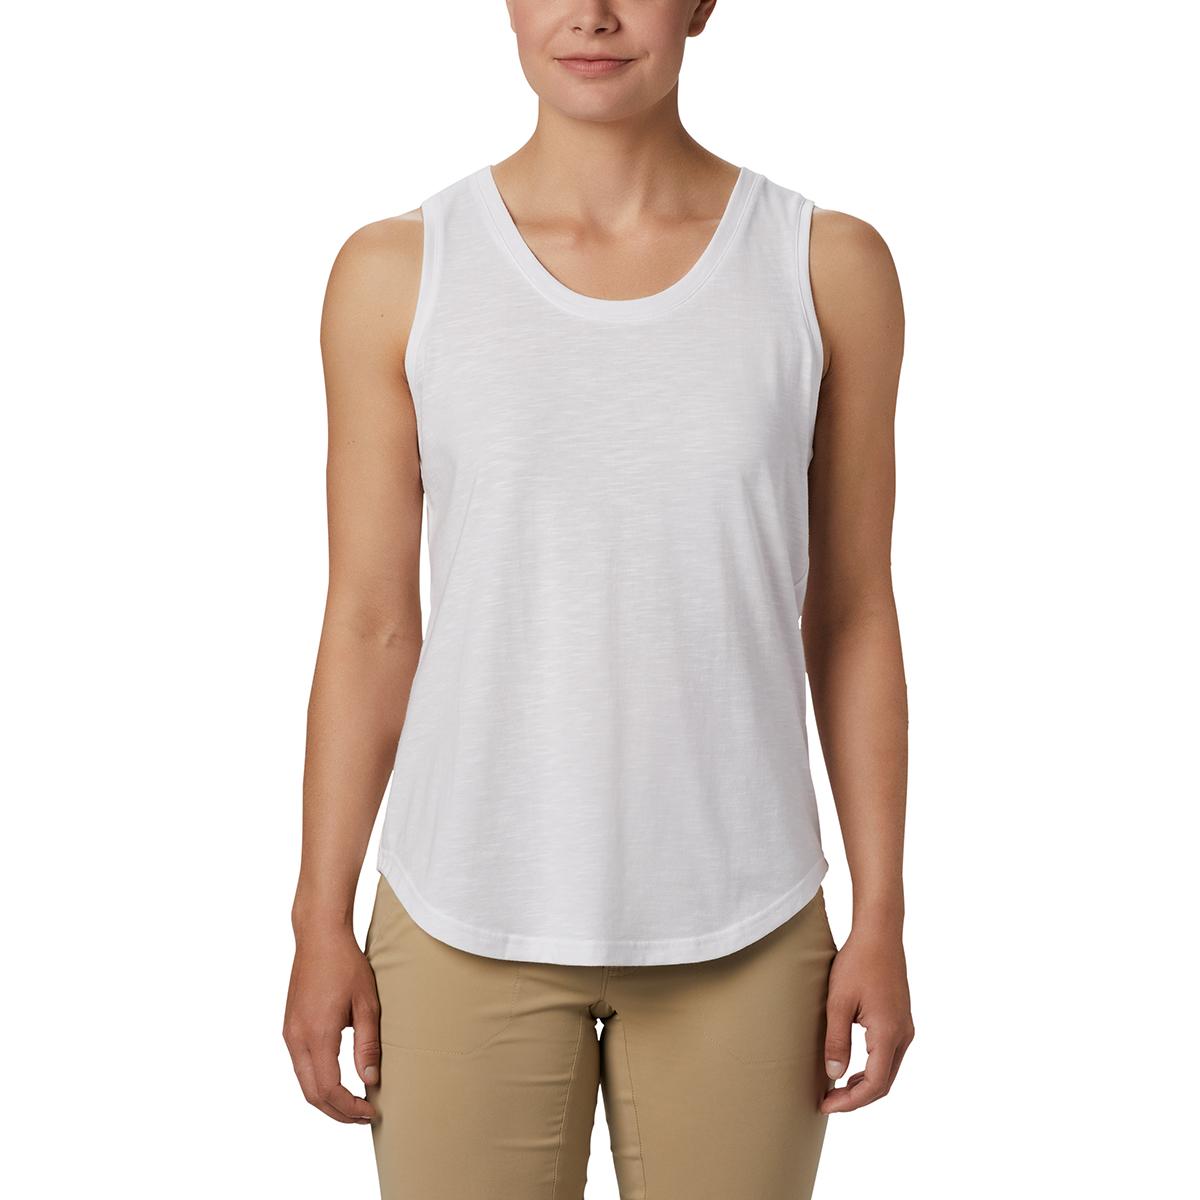 Columbia Women's Cades Cap Tank Top - White, S